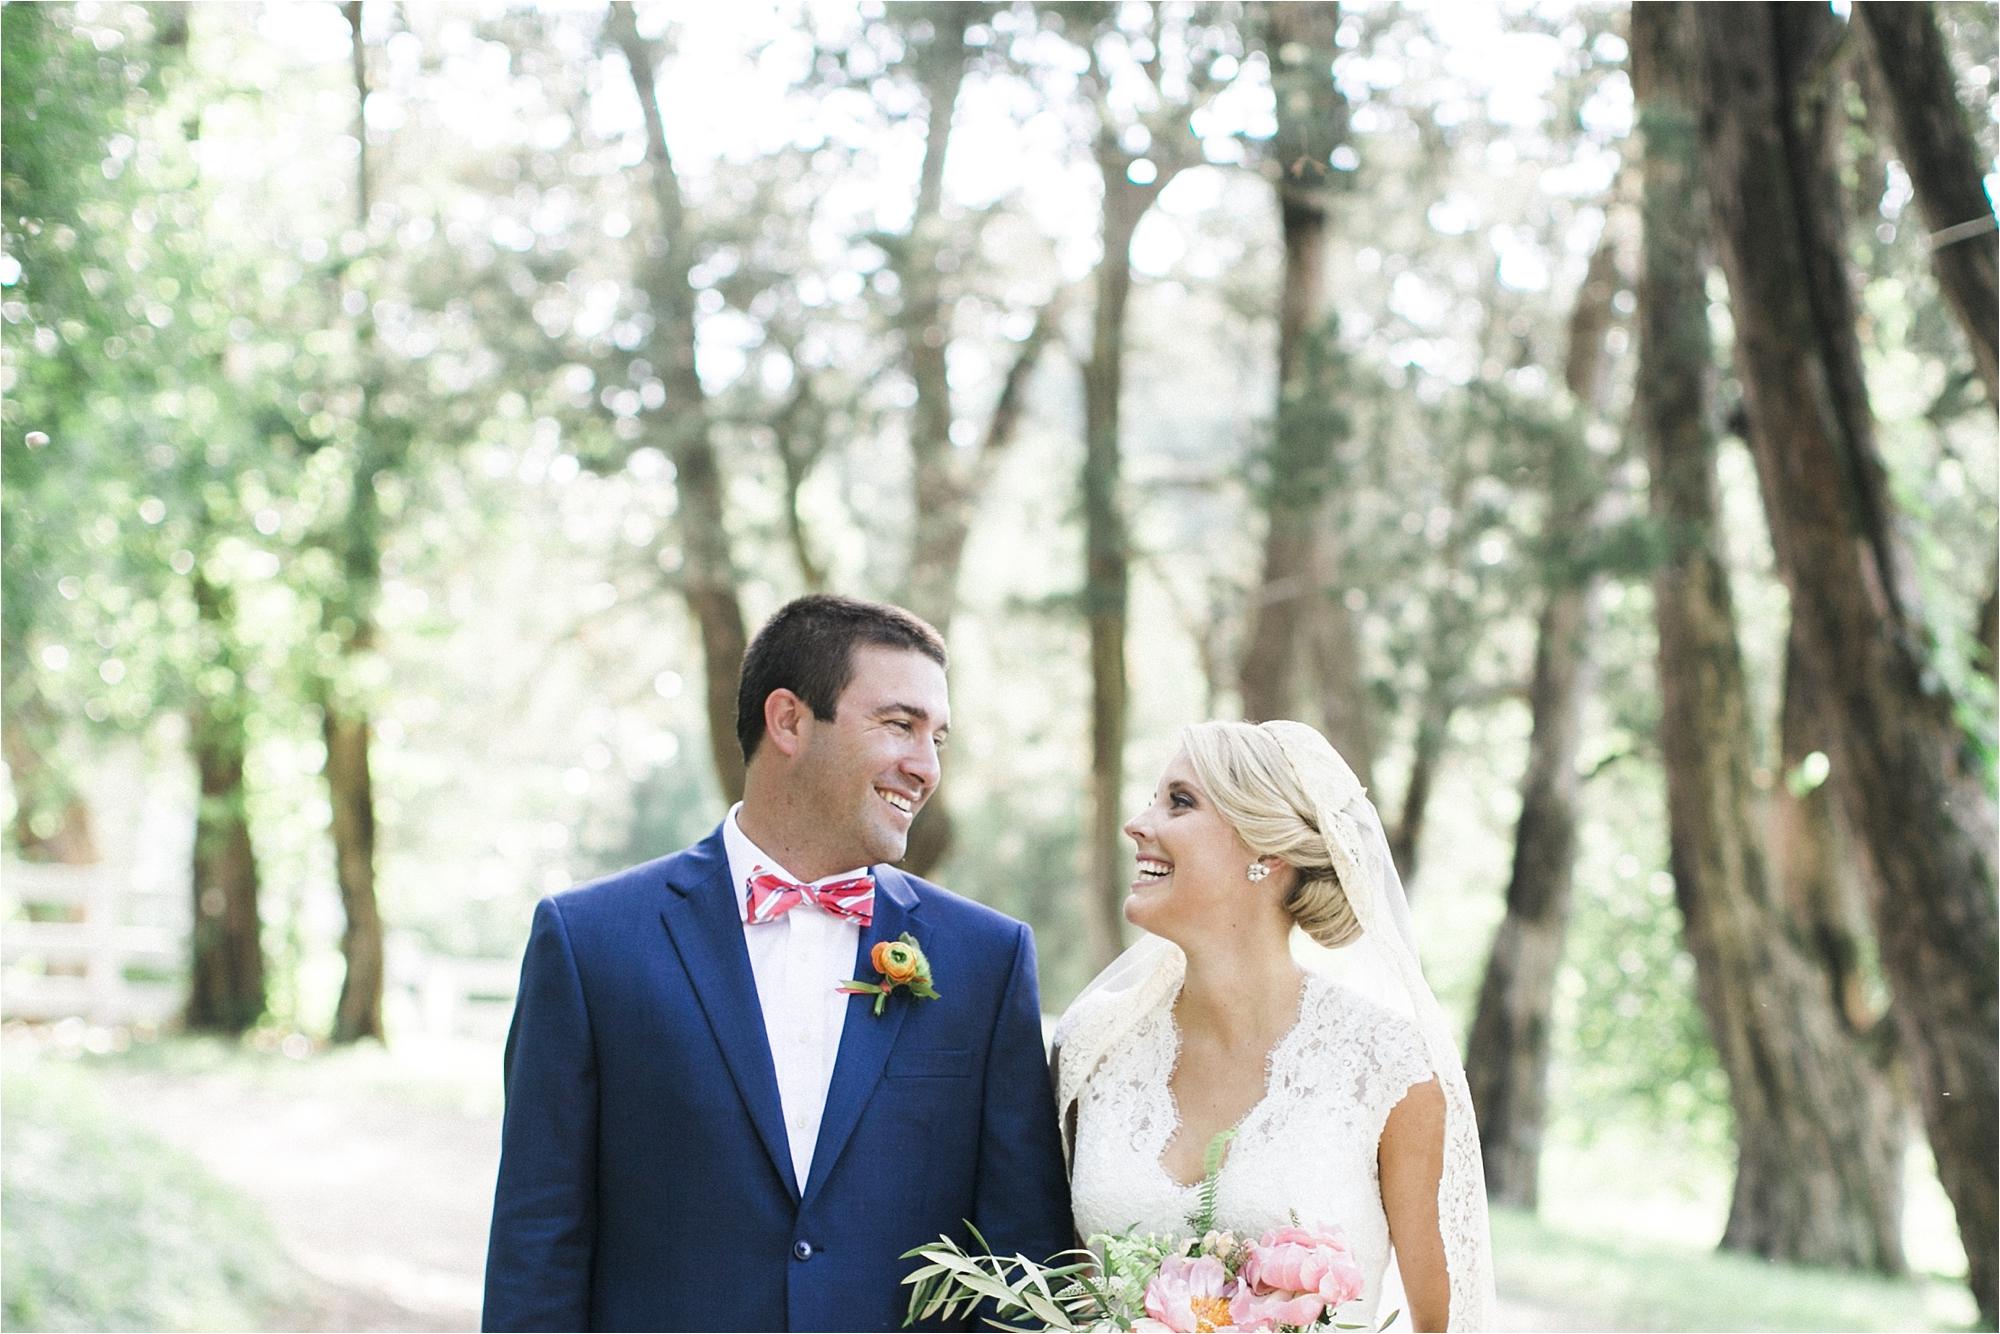 richmond-virginia-tuckahoe-plantation-coral-summer-wedding-stephanie-yonce-photos_0016.jpg